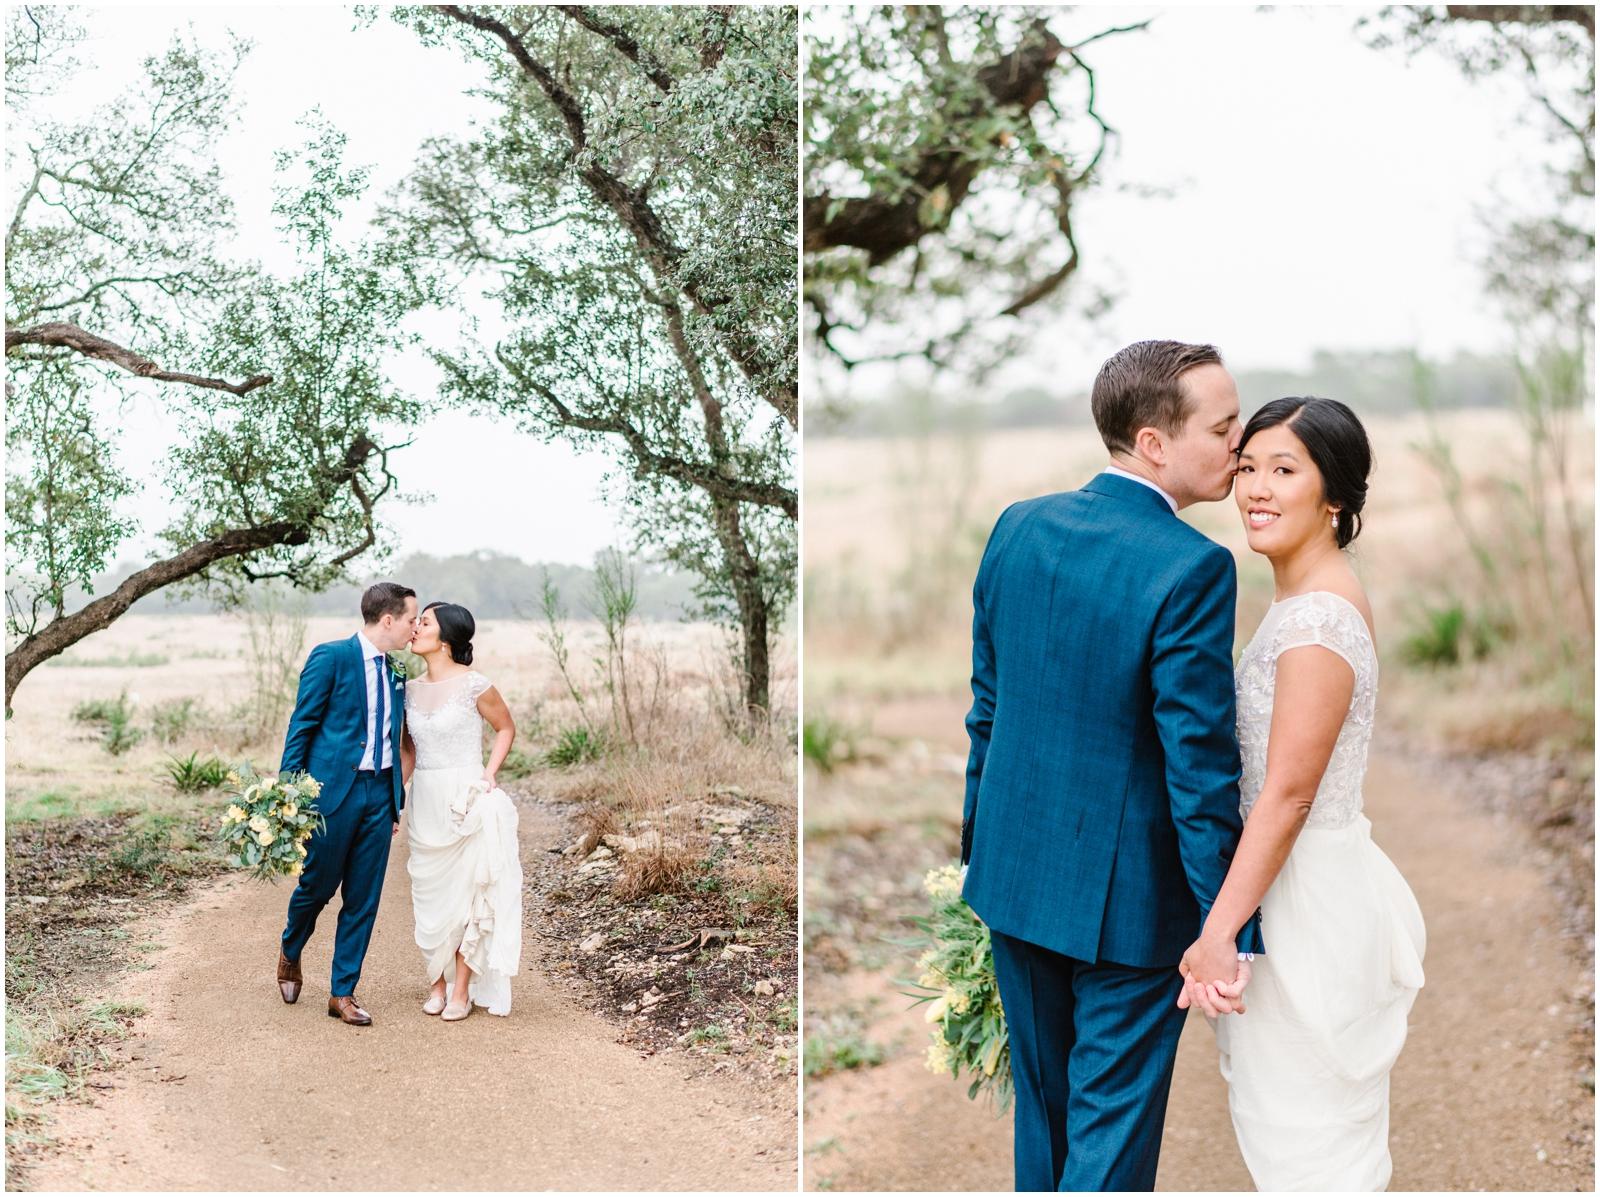 Minimalistic TX Venue Prosper House -Austin Wedding Planner_0353.jpg